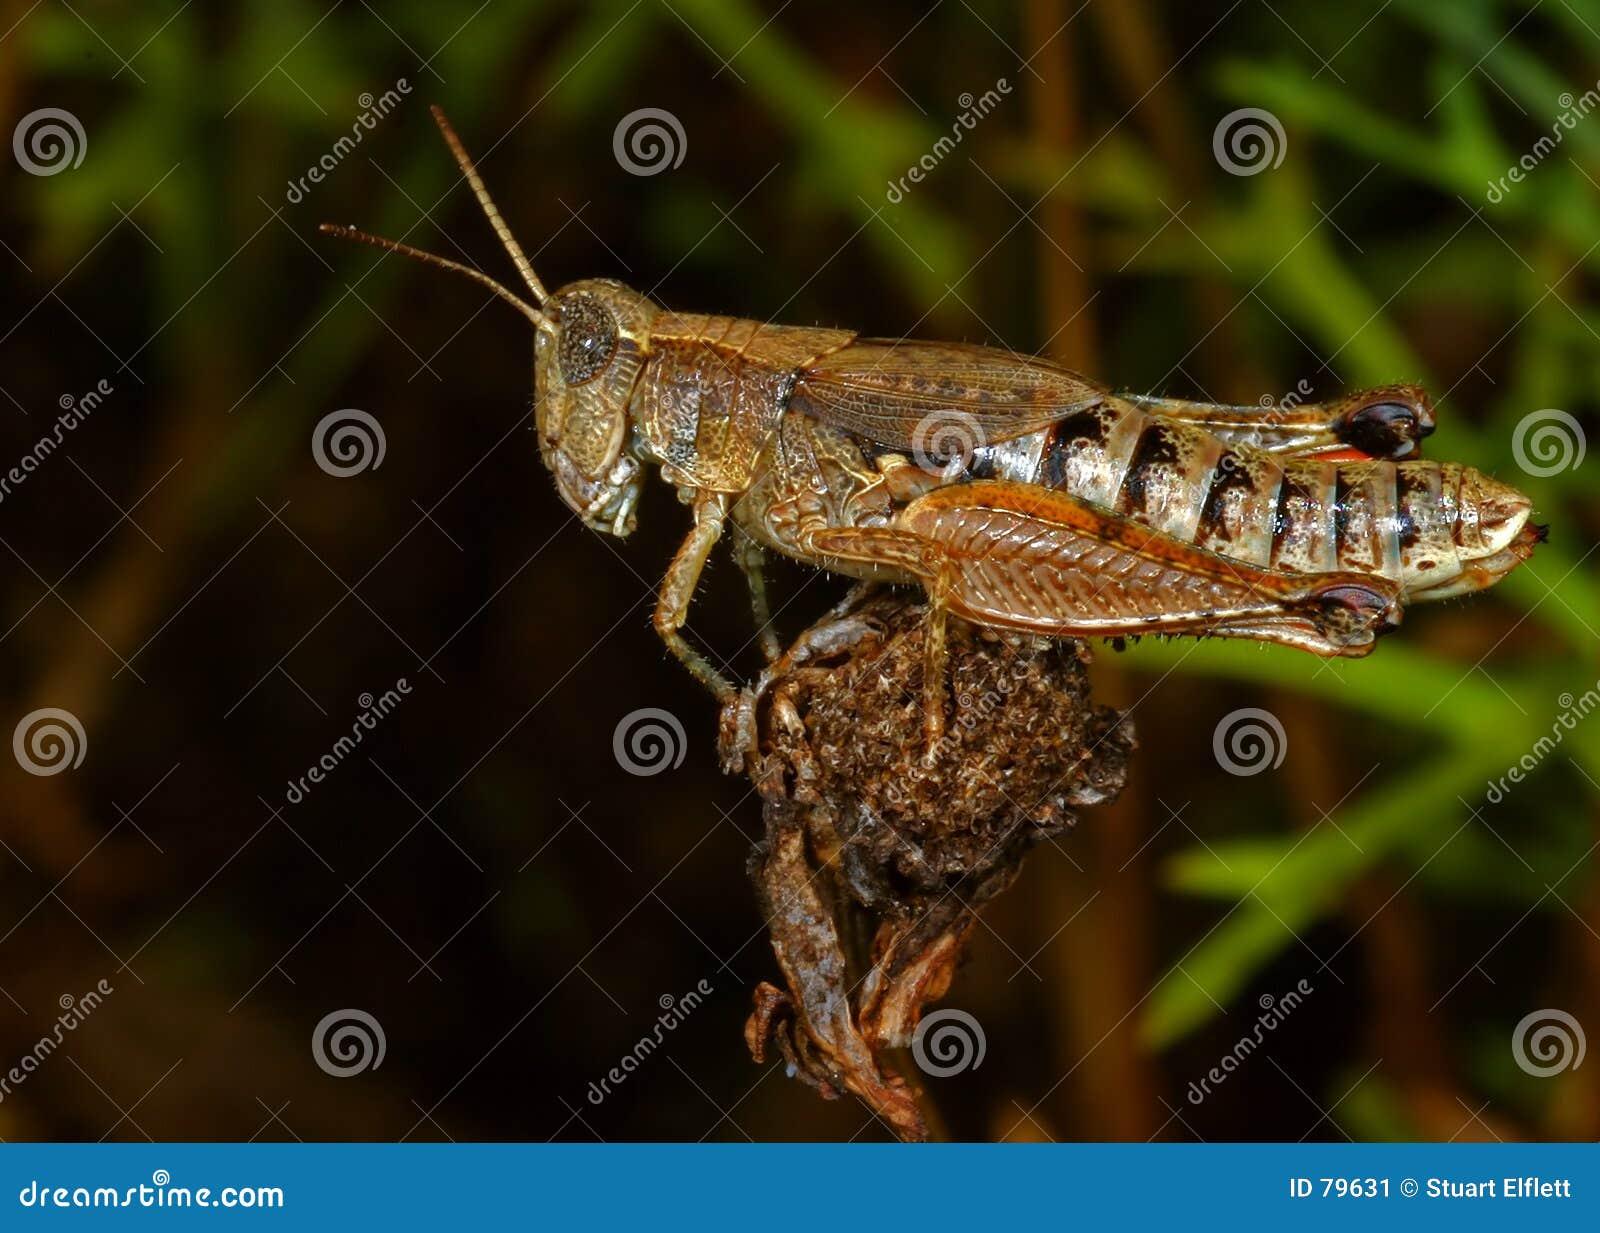 Aaaaah grasshopper